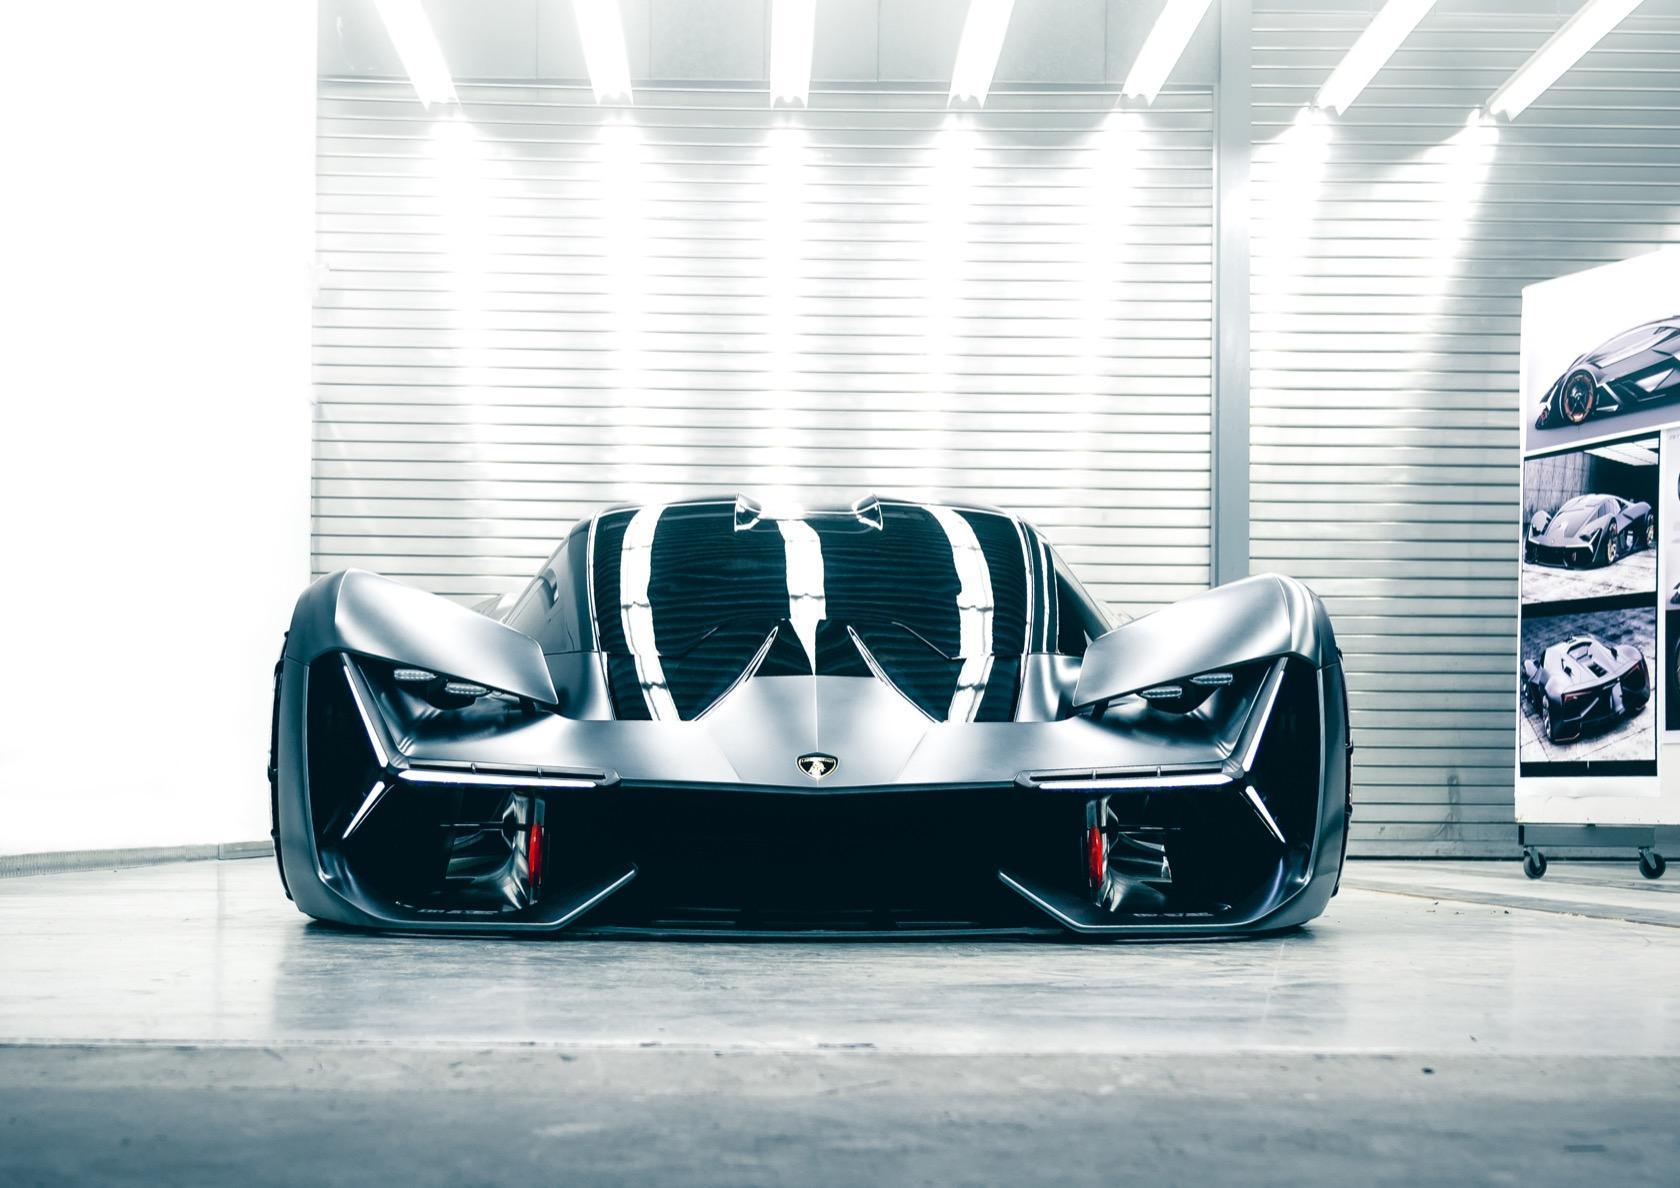 Lamborghini Terzo Millennio The Raging Bull Goes Electric Slashgear